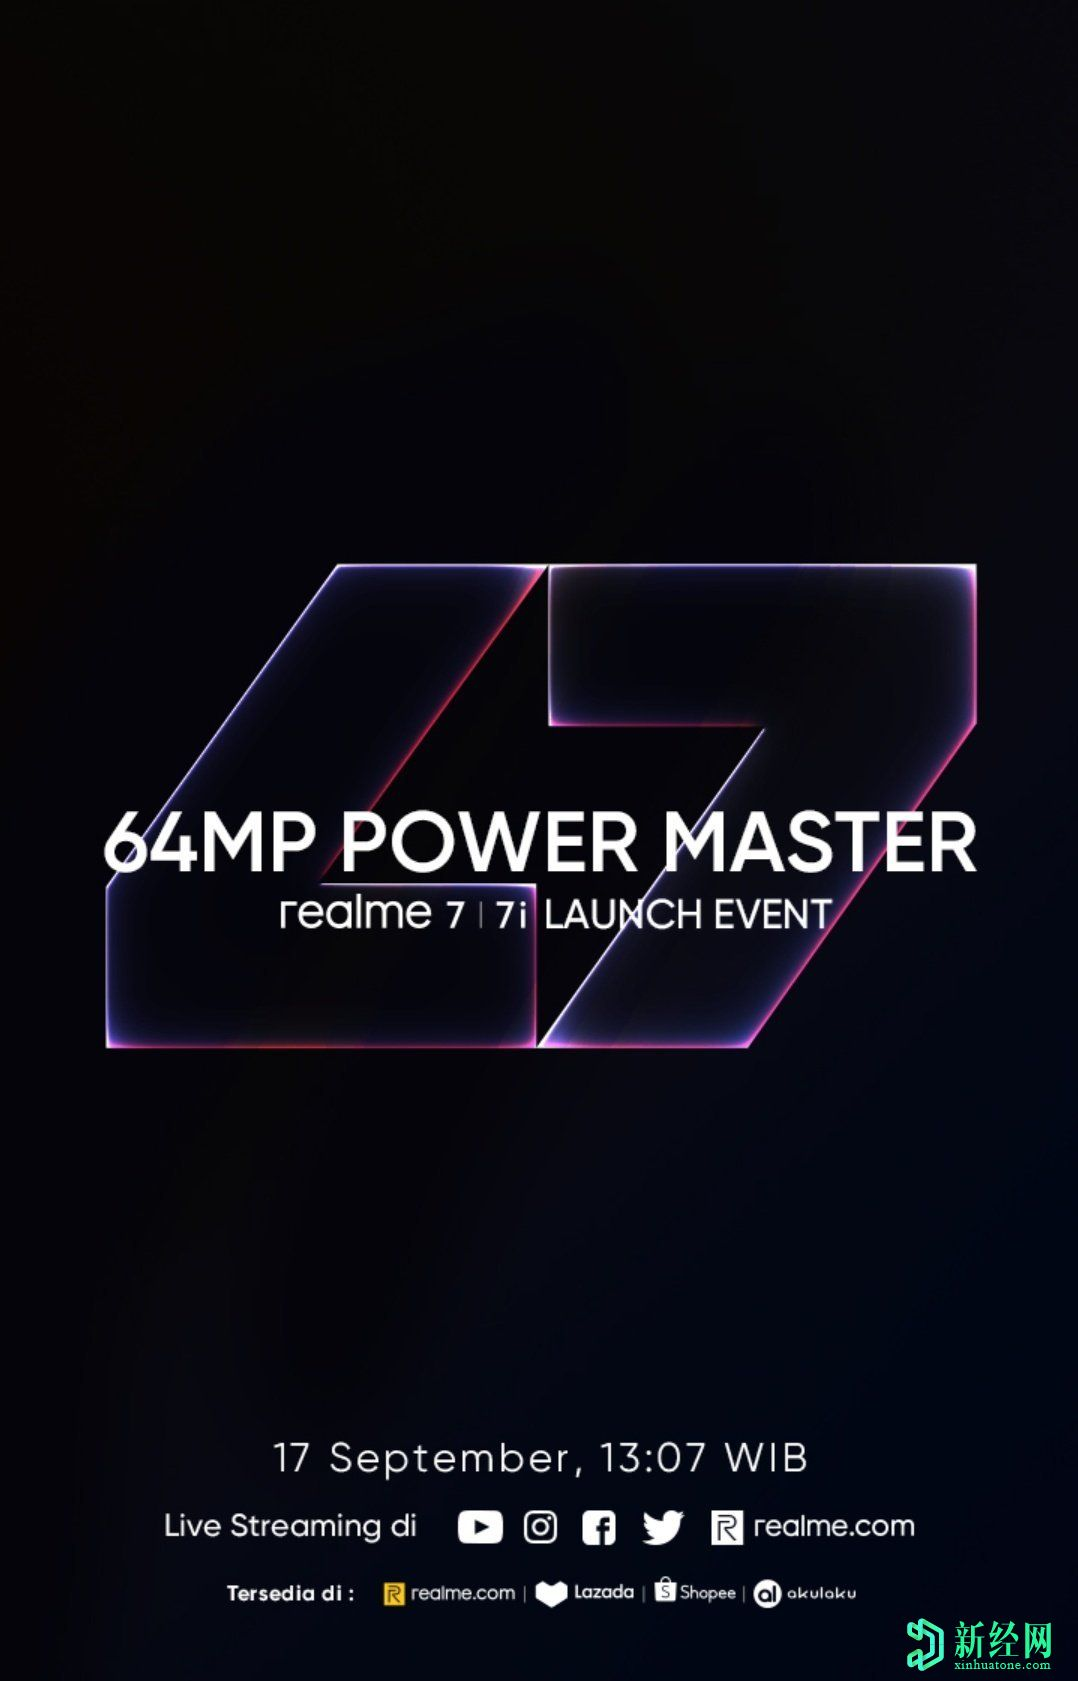 Realme 7、7i将于9月17日发布;Realme 7i的完整规格并导致泄漏